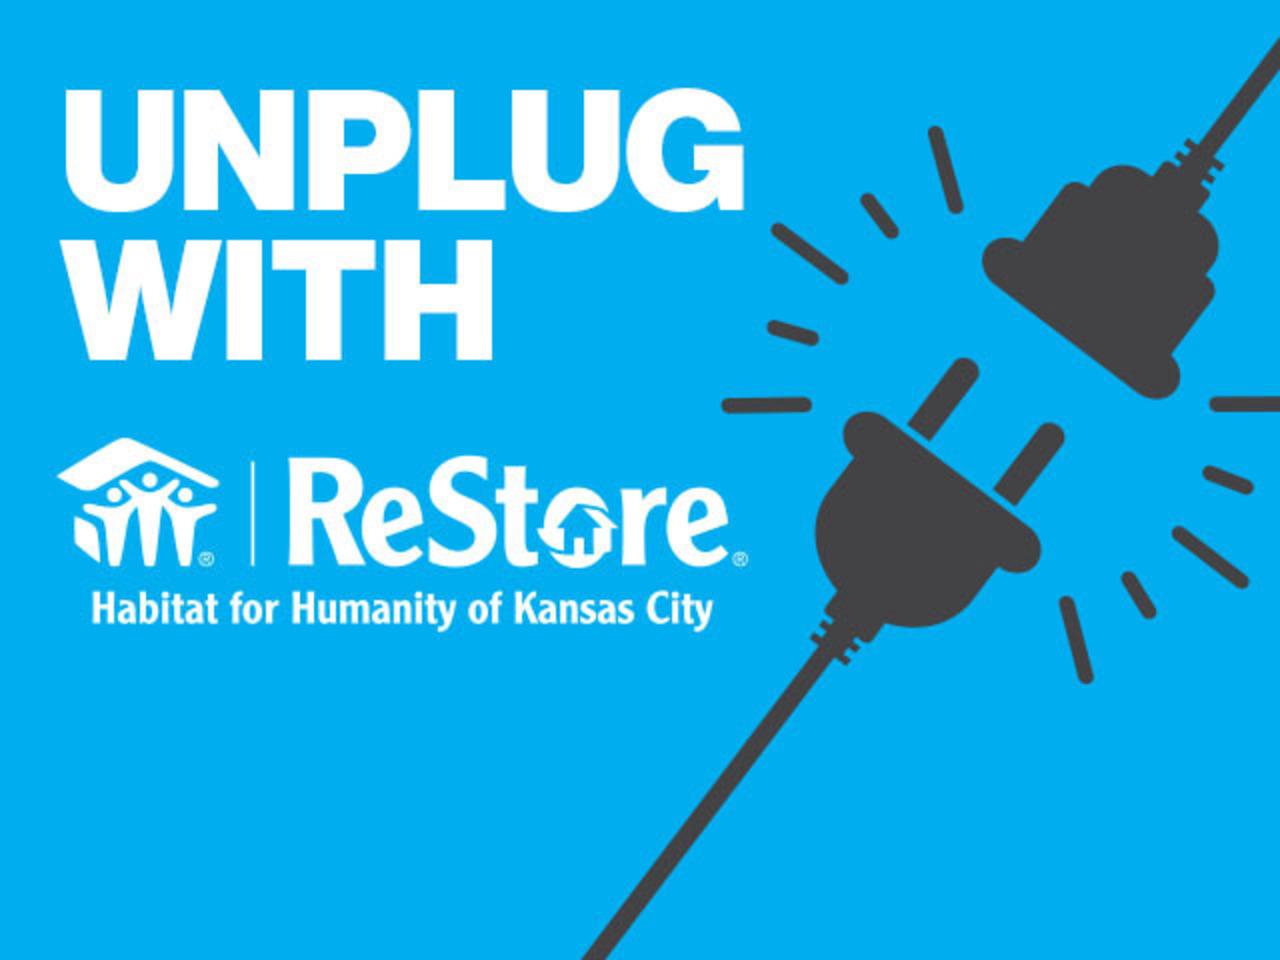 Unplug with ReStore 2020